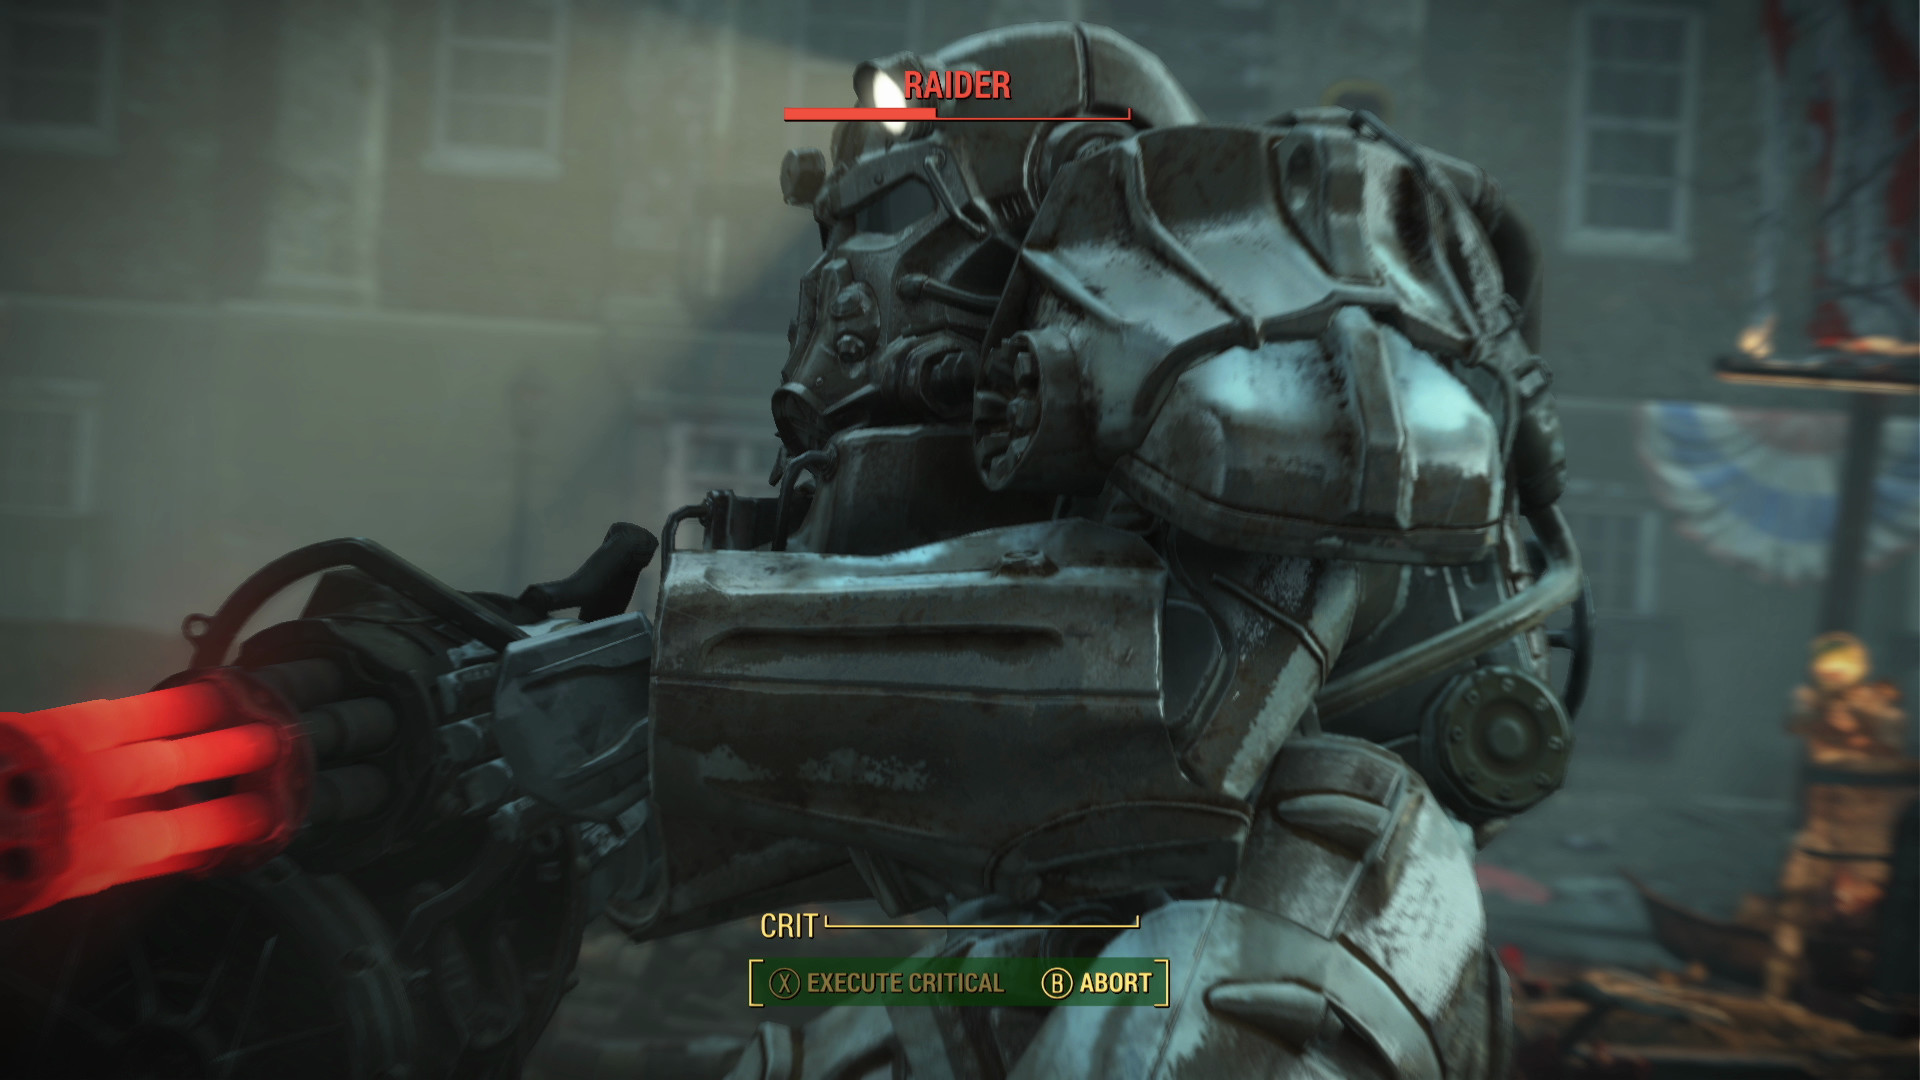 E3: Fallout 4 – More Screenshots